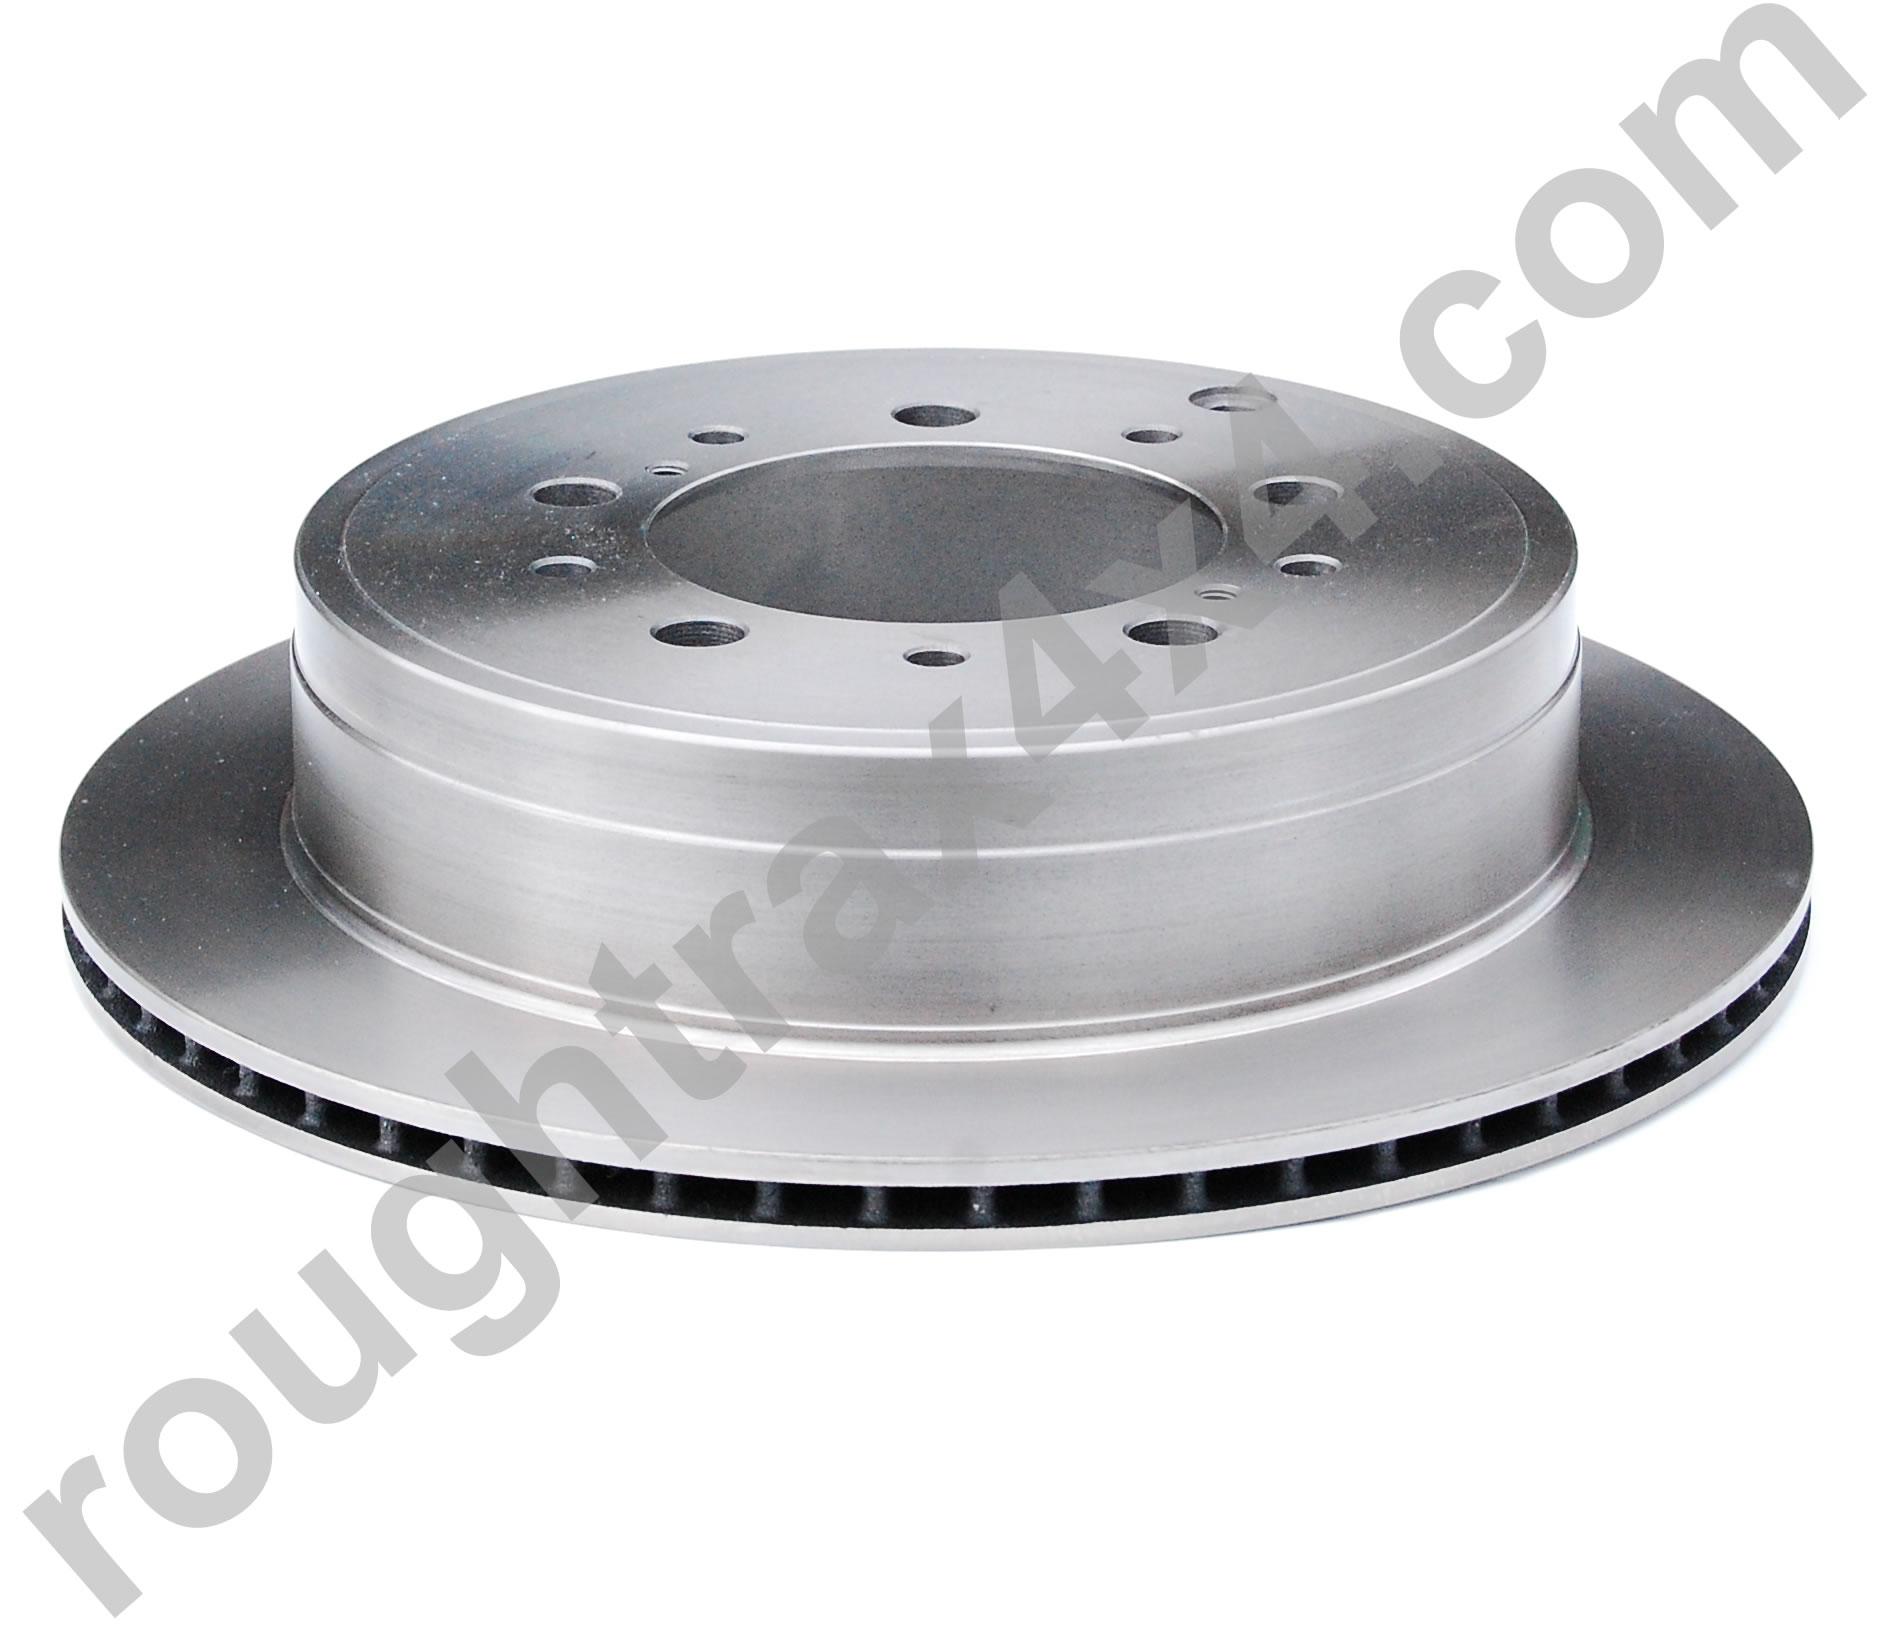 brakeworld rear brake disc pad kit brake kits brakes. Black Bedroom Furniture Sets. Home Design Ideas